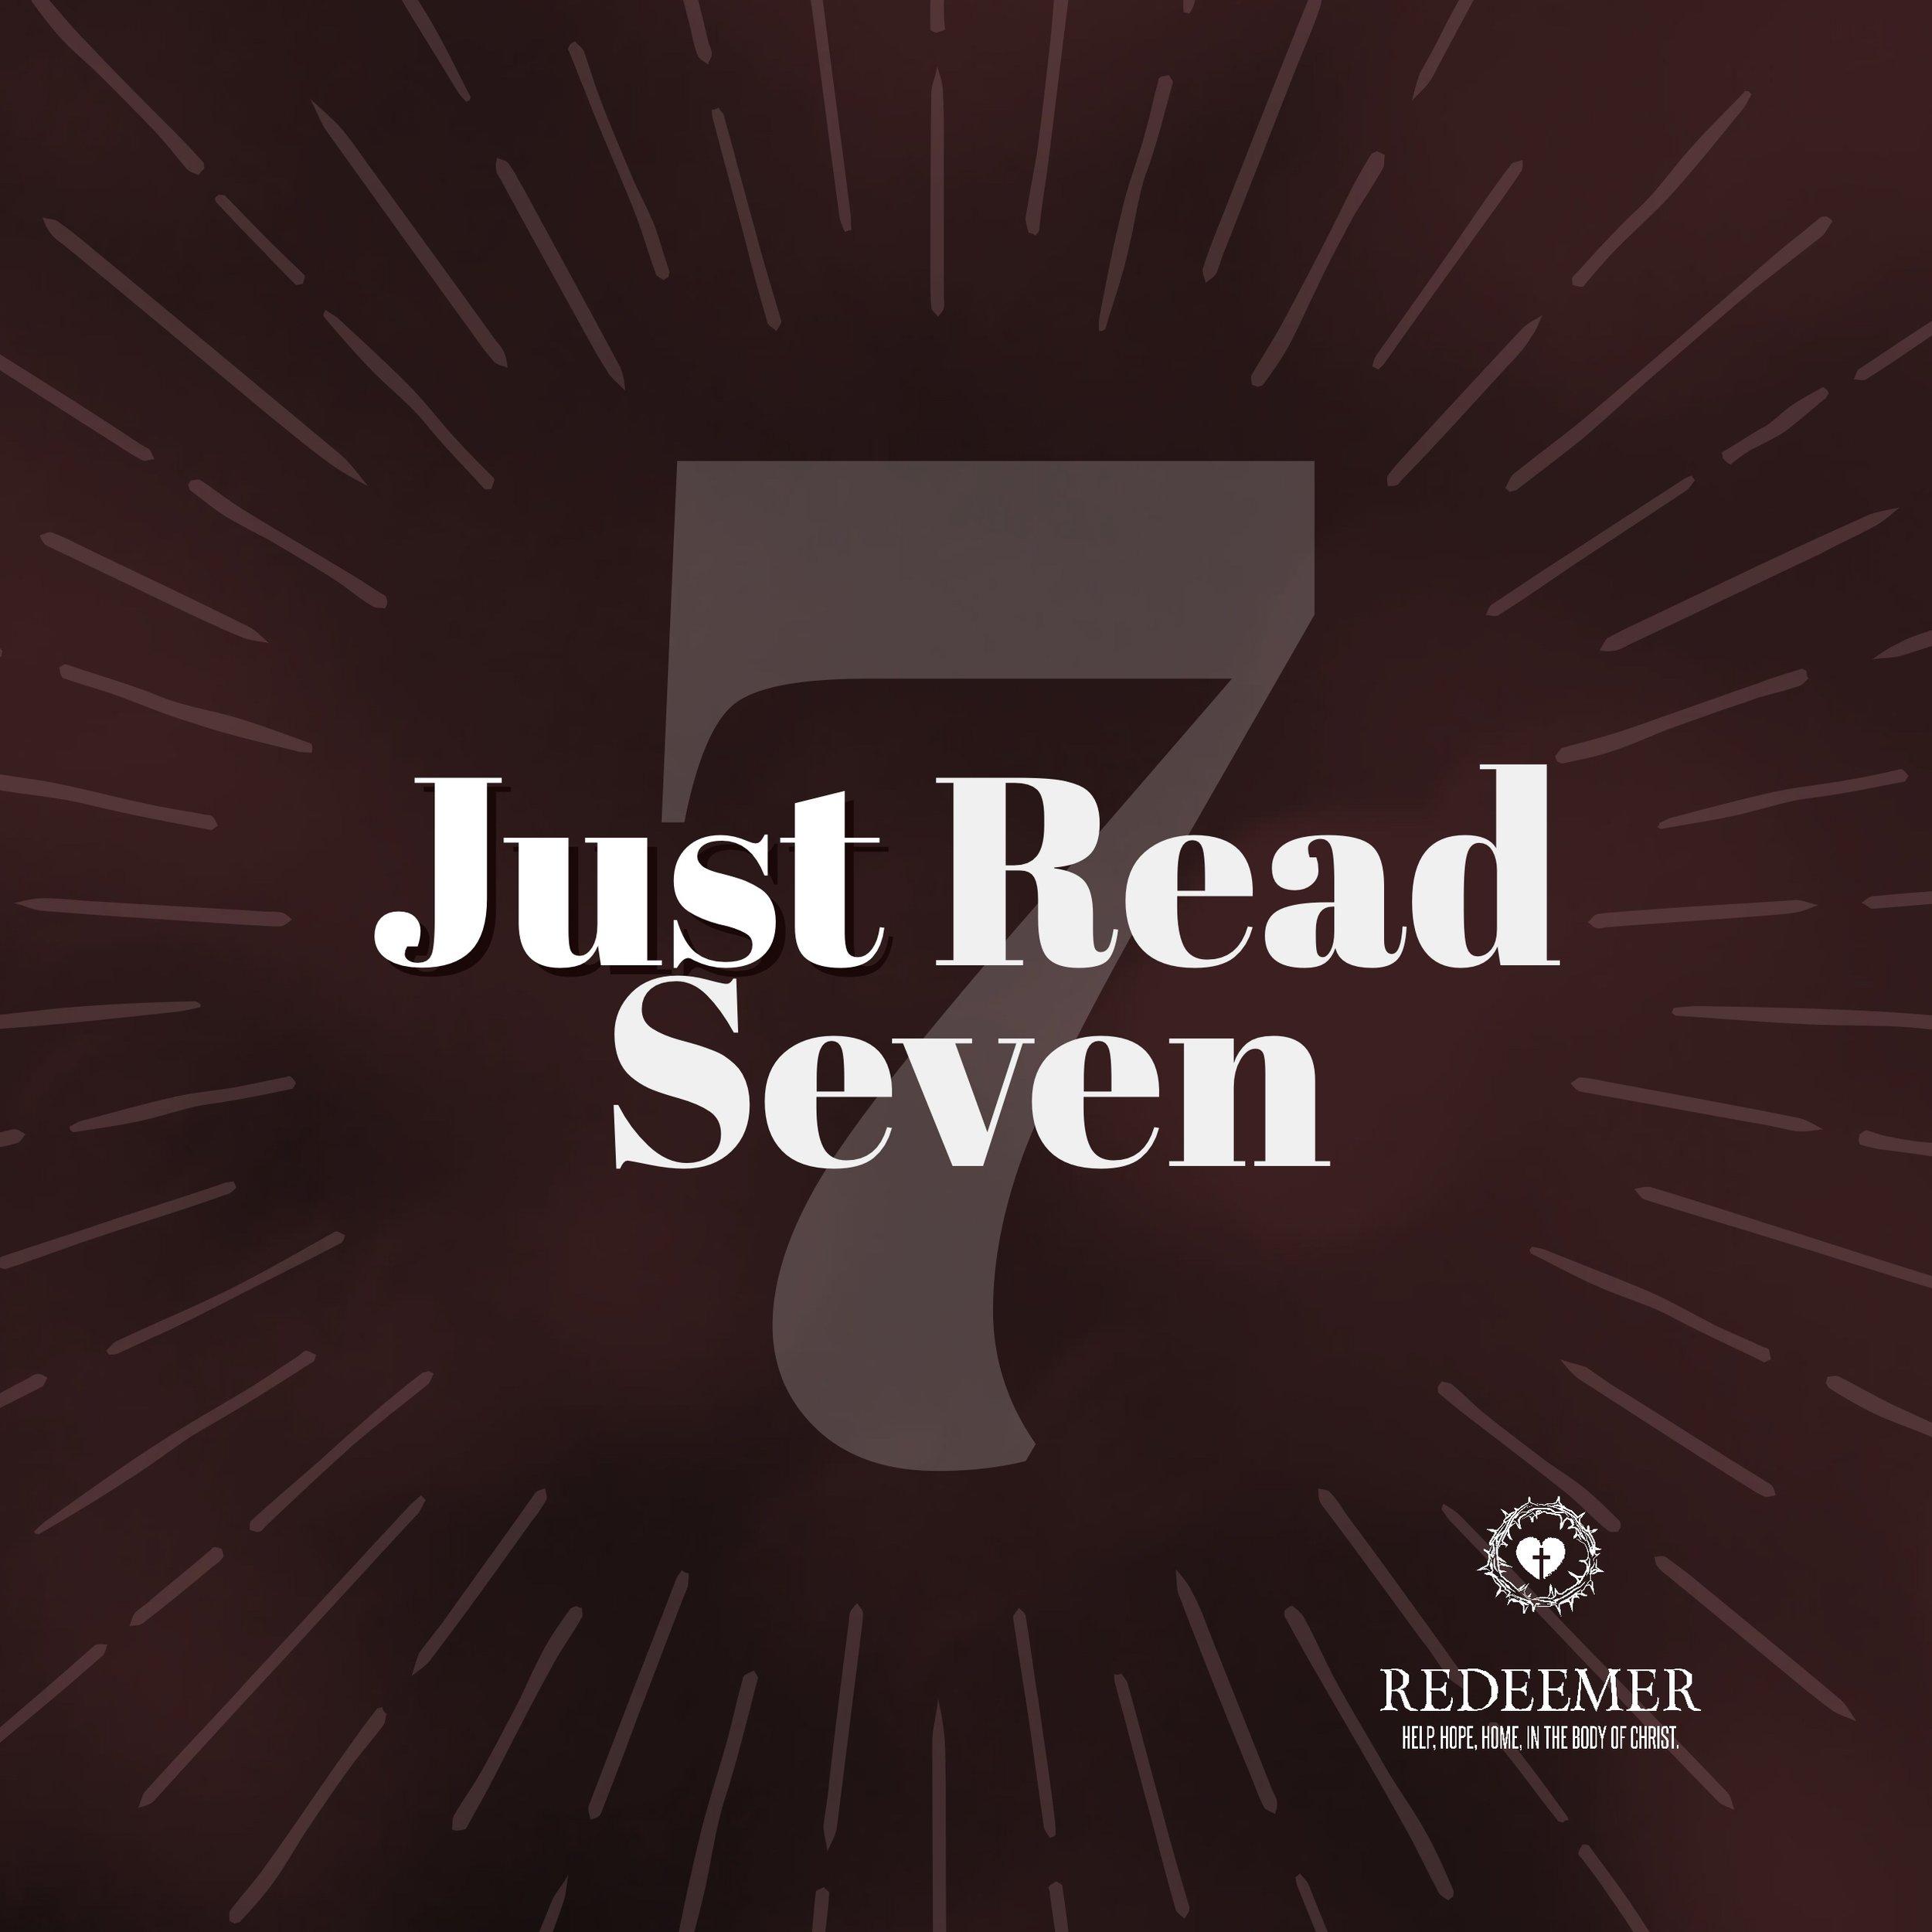 Just_read_seven_square.jpeg